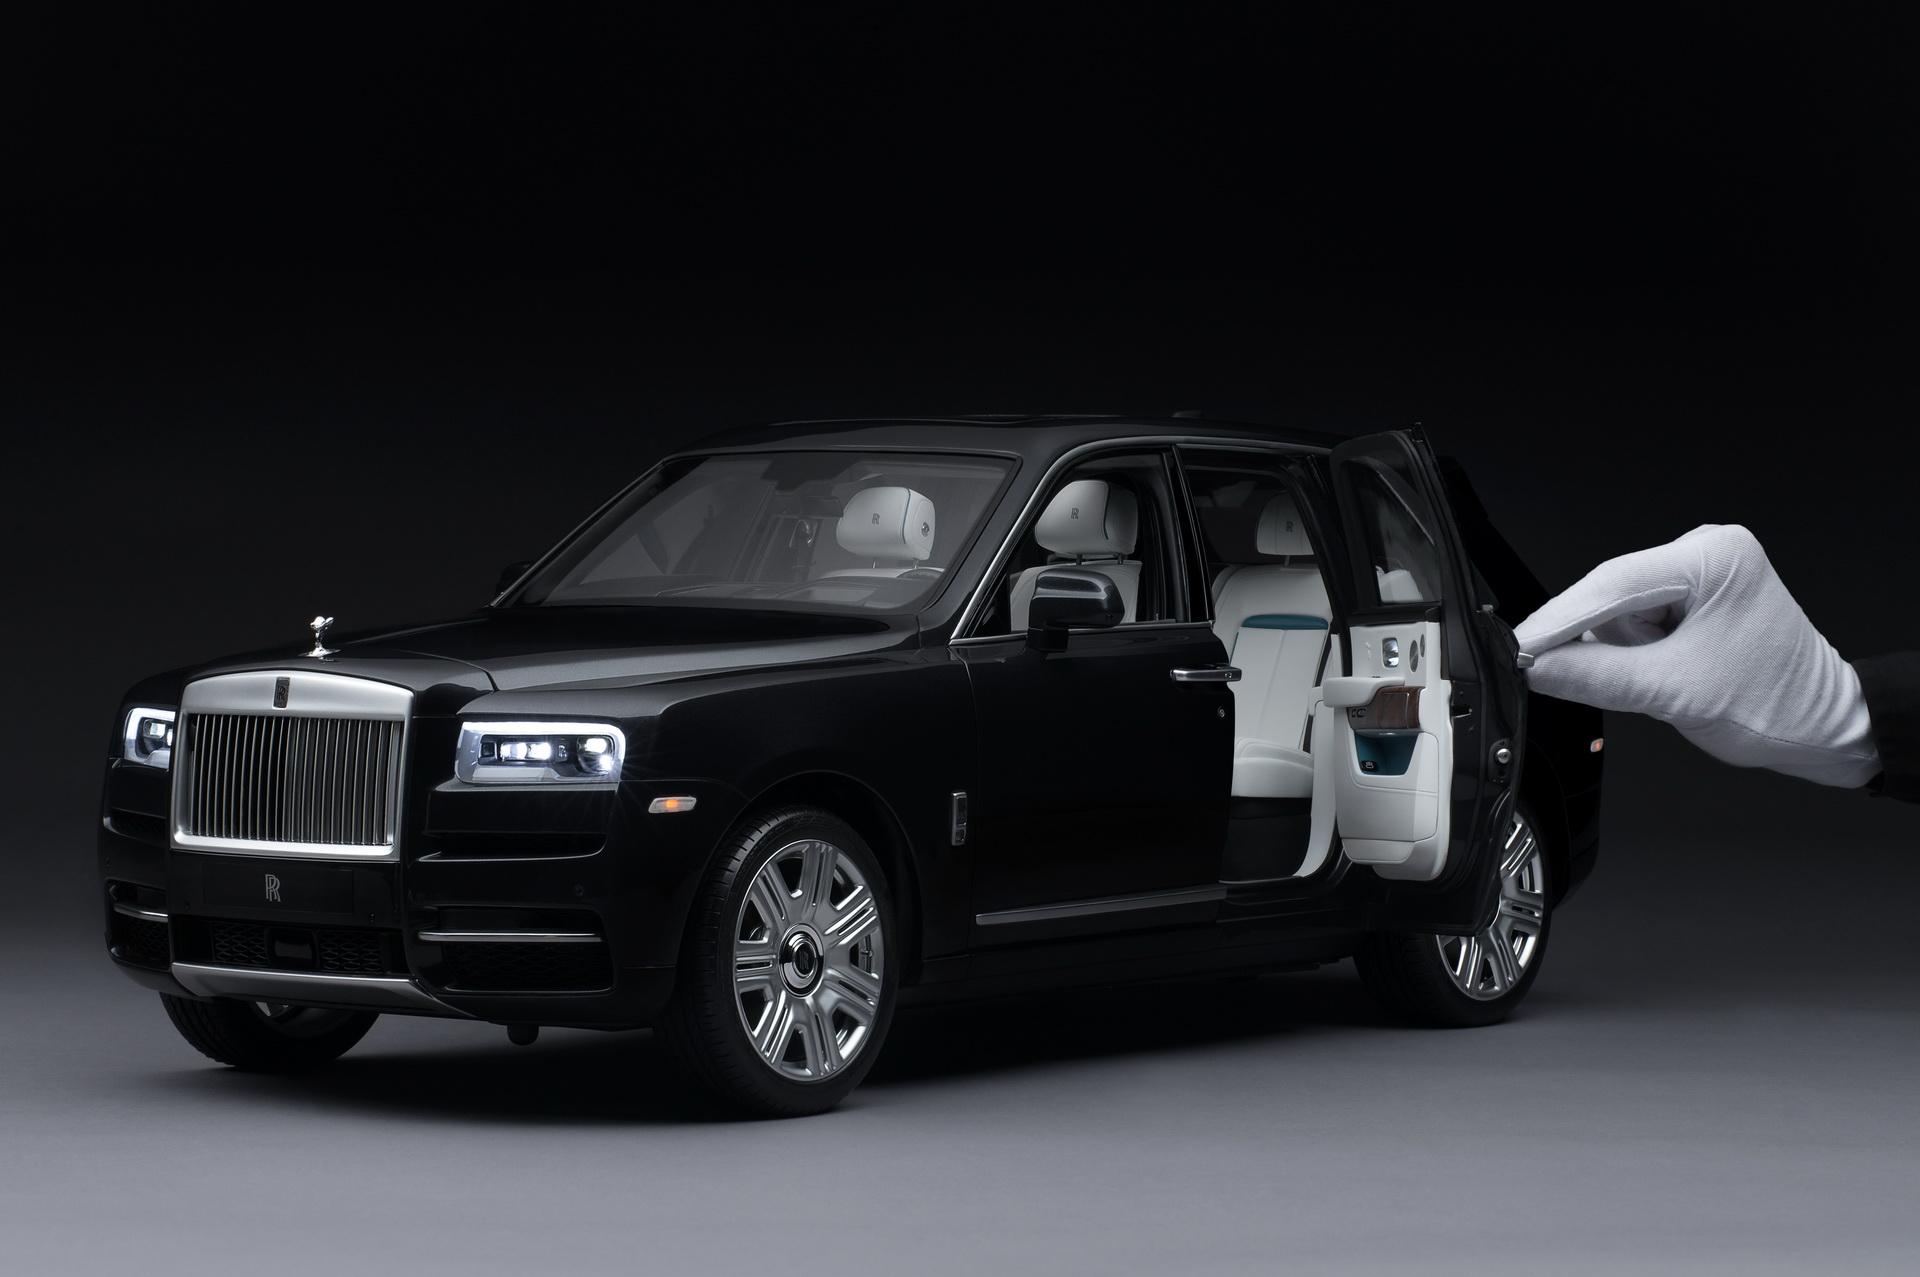 Rolls-Royce Cullinan w skali 1:8 – Jak prawdziwy